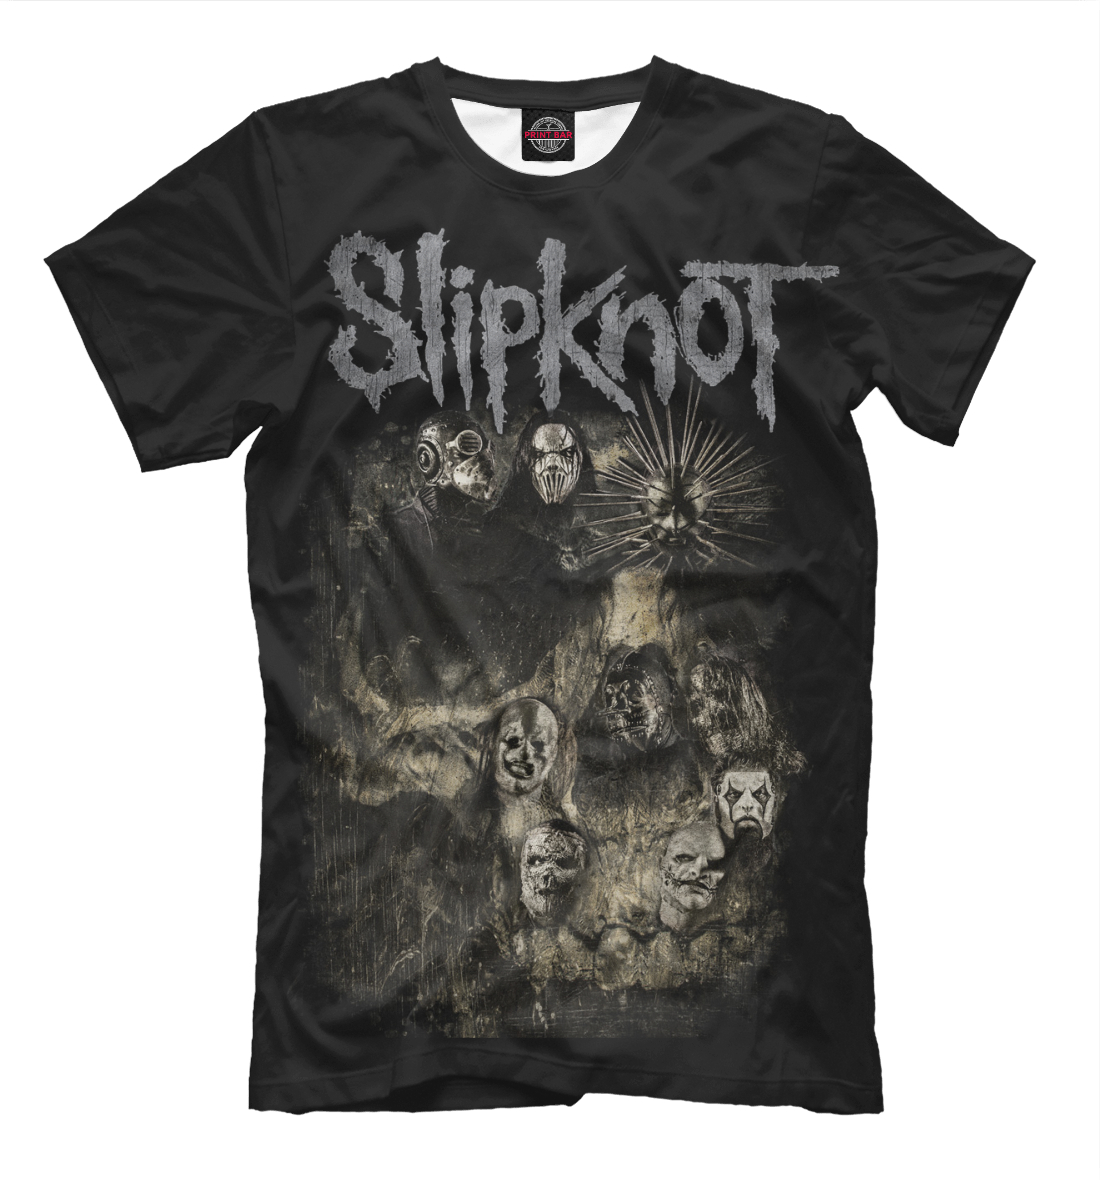 Купить Slipknot, Printbar, Футболки, SLI-884745-fut-2